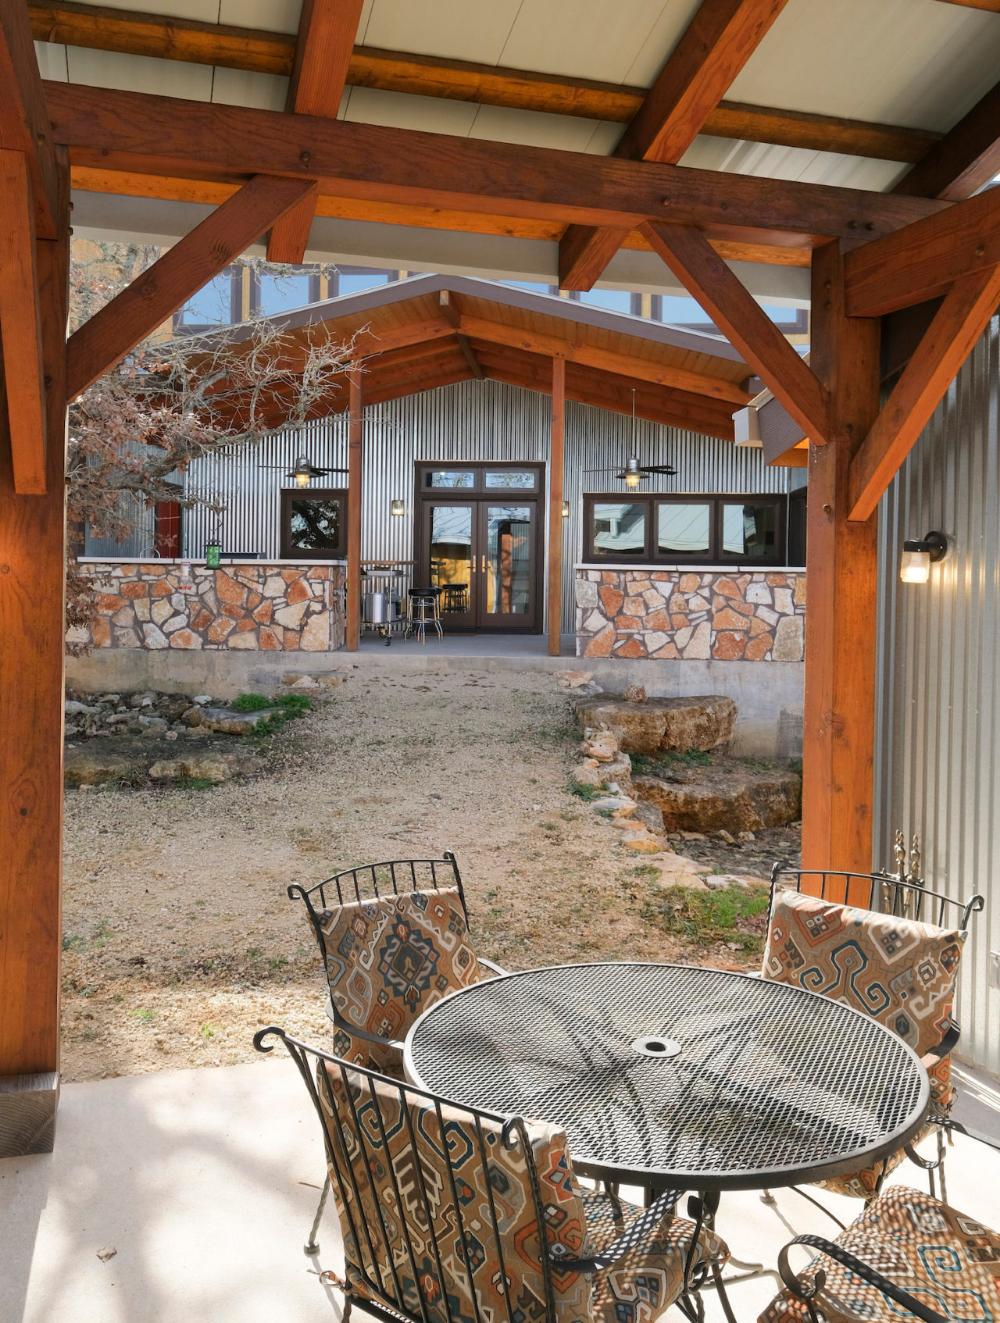 Compact Hybrid Timber Frame Home Design Photos Timber Home Living: Architect House, Timber Frame Homes, Outdoor Decor